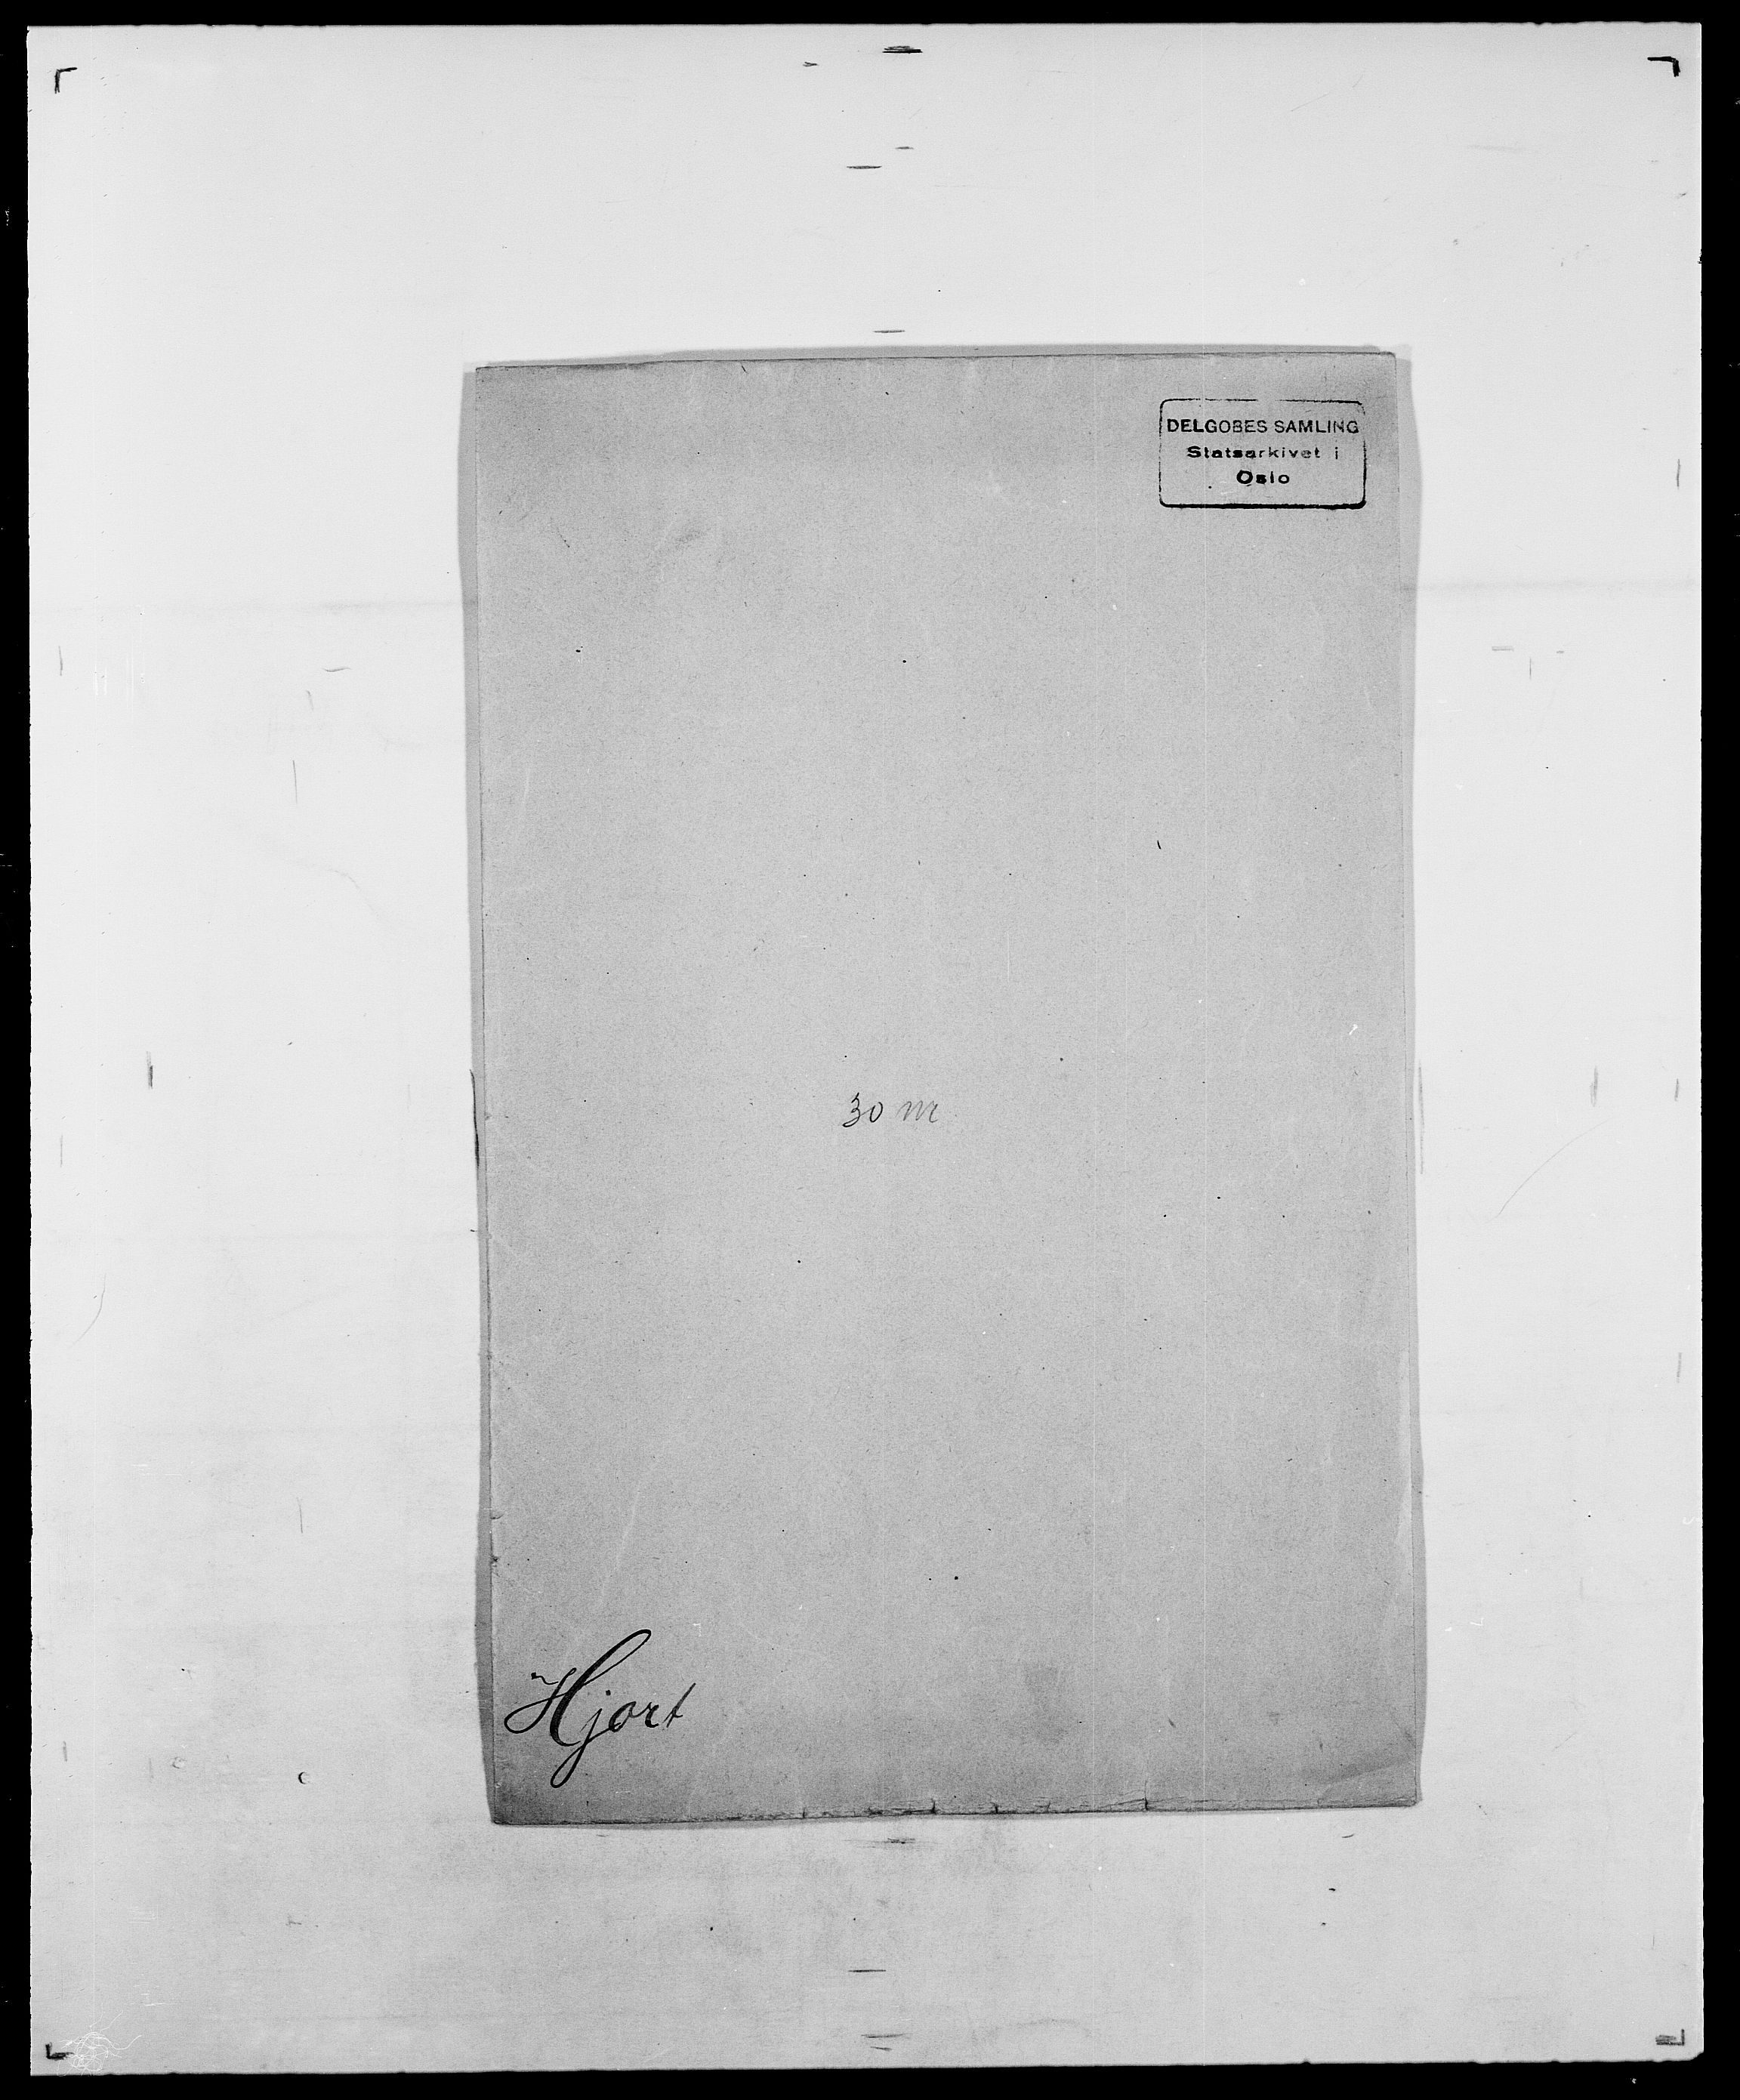 SAO, Delgobe, Charles Antoine - samling, D/Da/L0017: Helander - Hjørne, s. 566